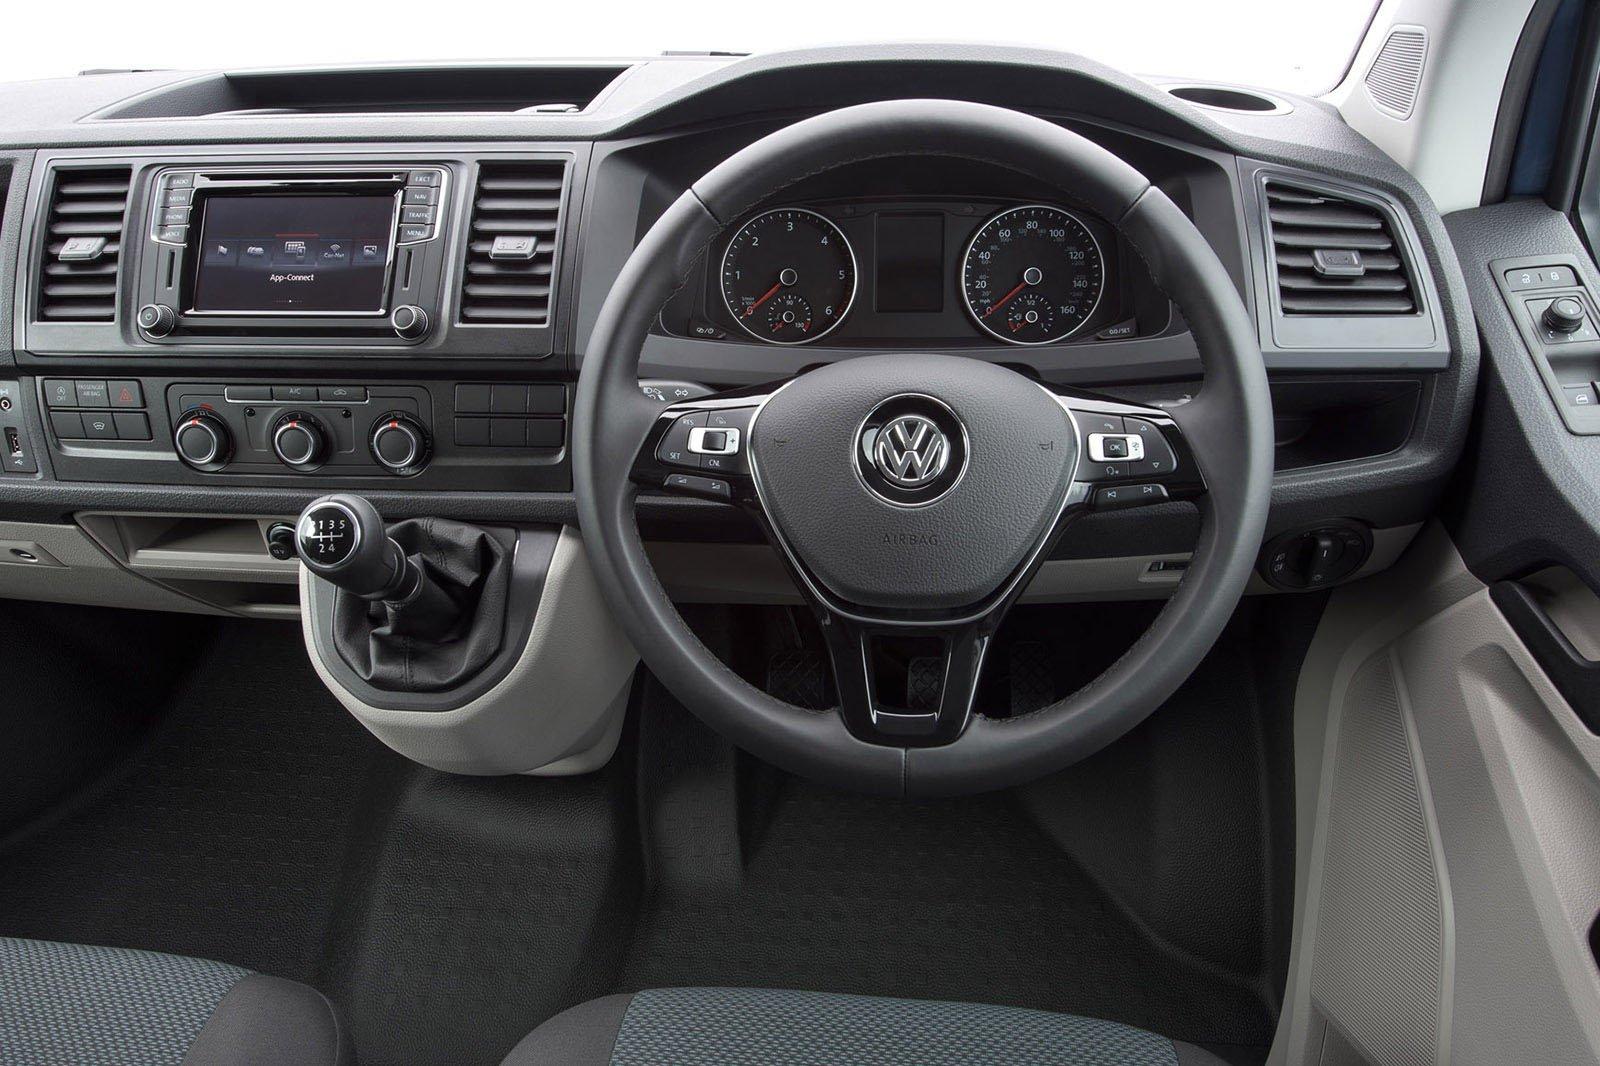 Volkswagen Transporter T6 interior